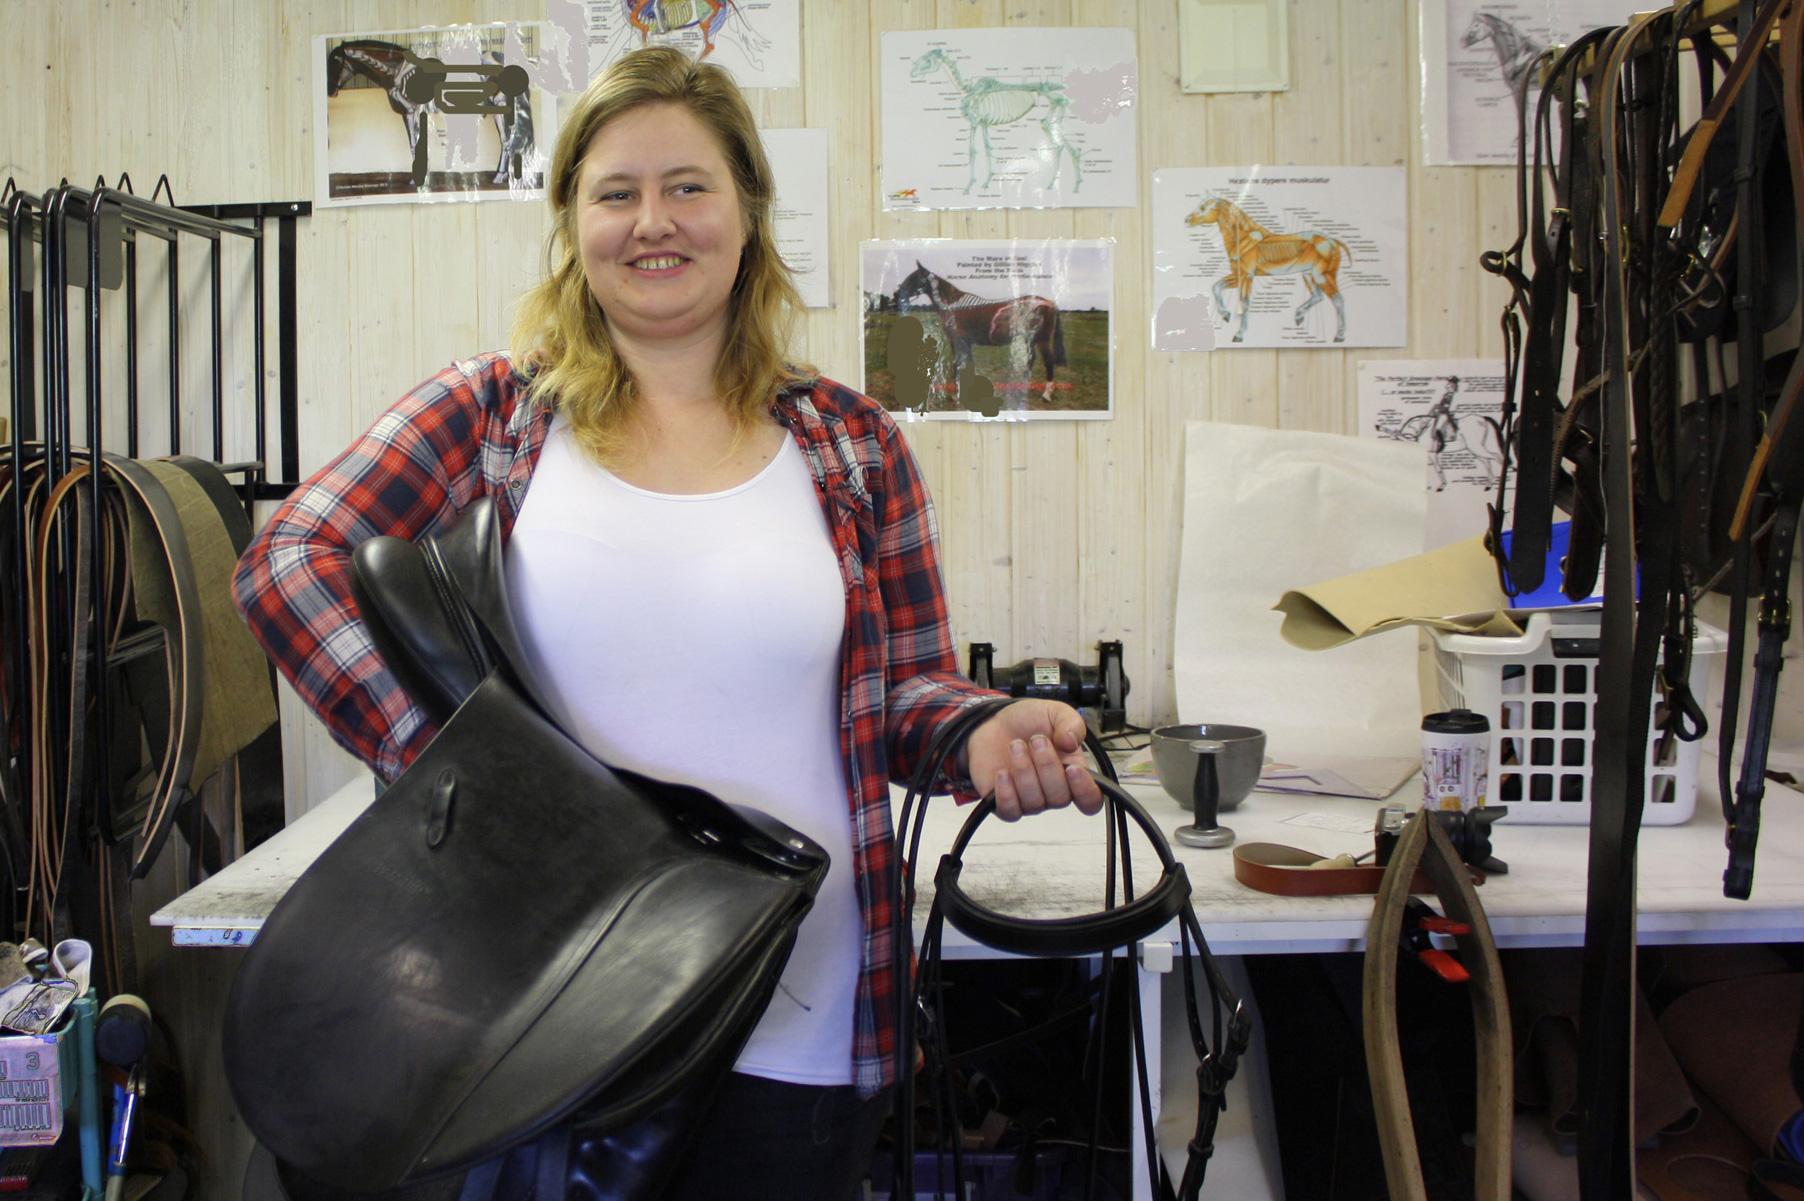 Karina-med-svennestykke-sal-til-hest